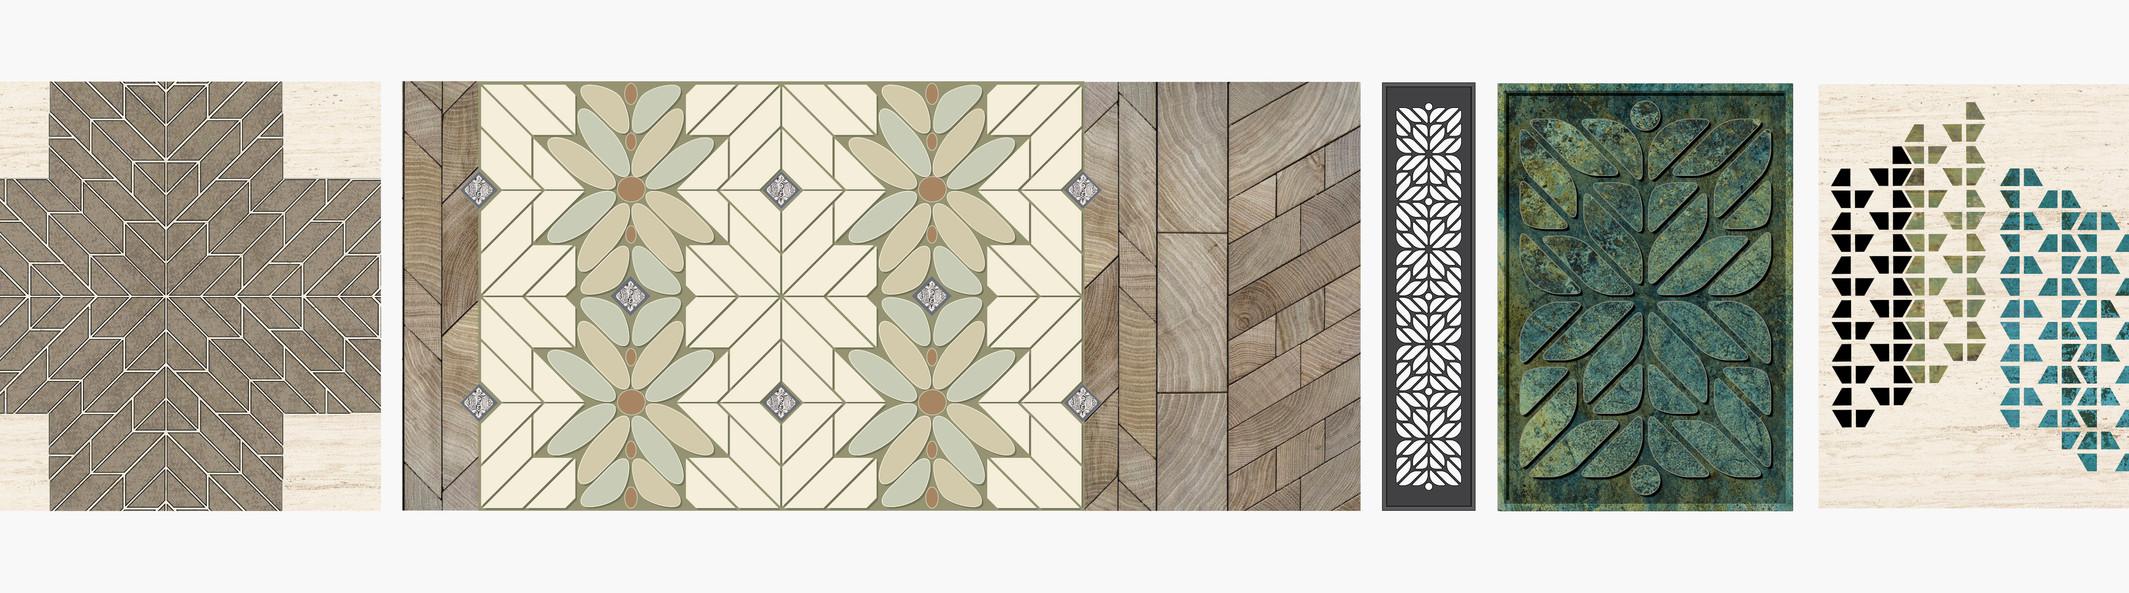 Custom decorative landscape design vernaular system.